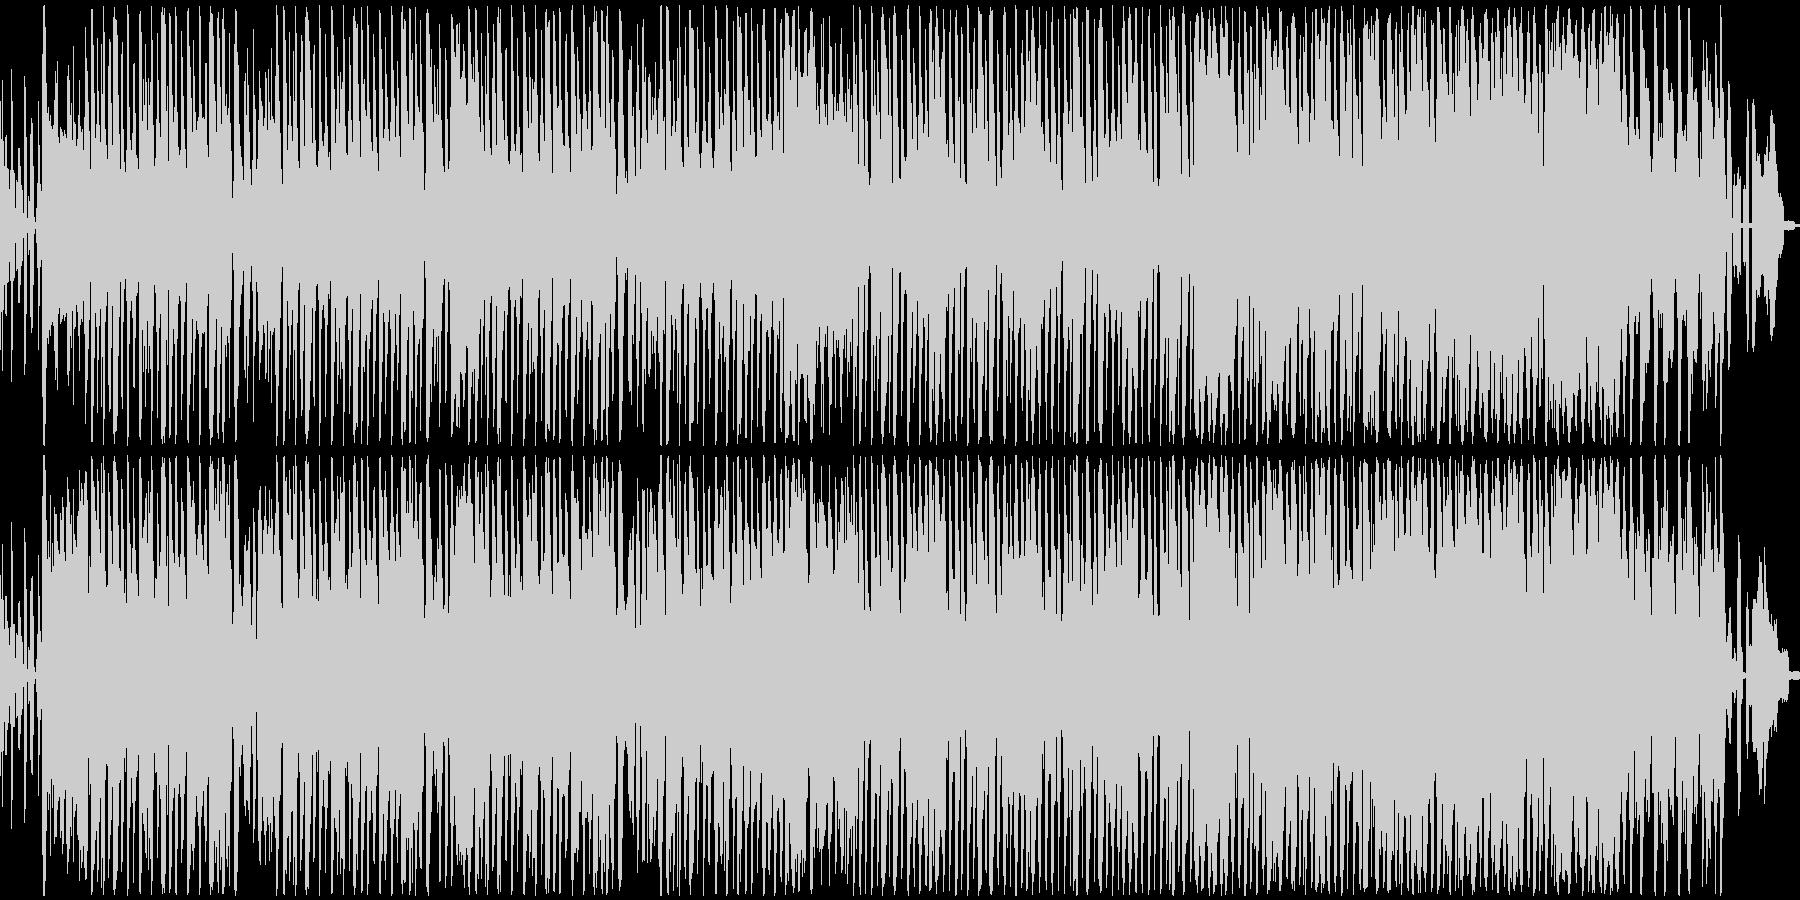 Renaissance Beatの未再生の波形